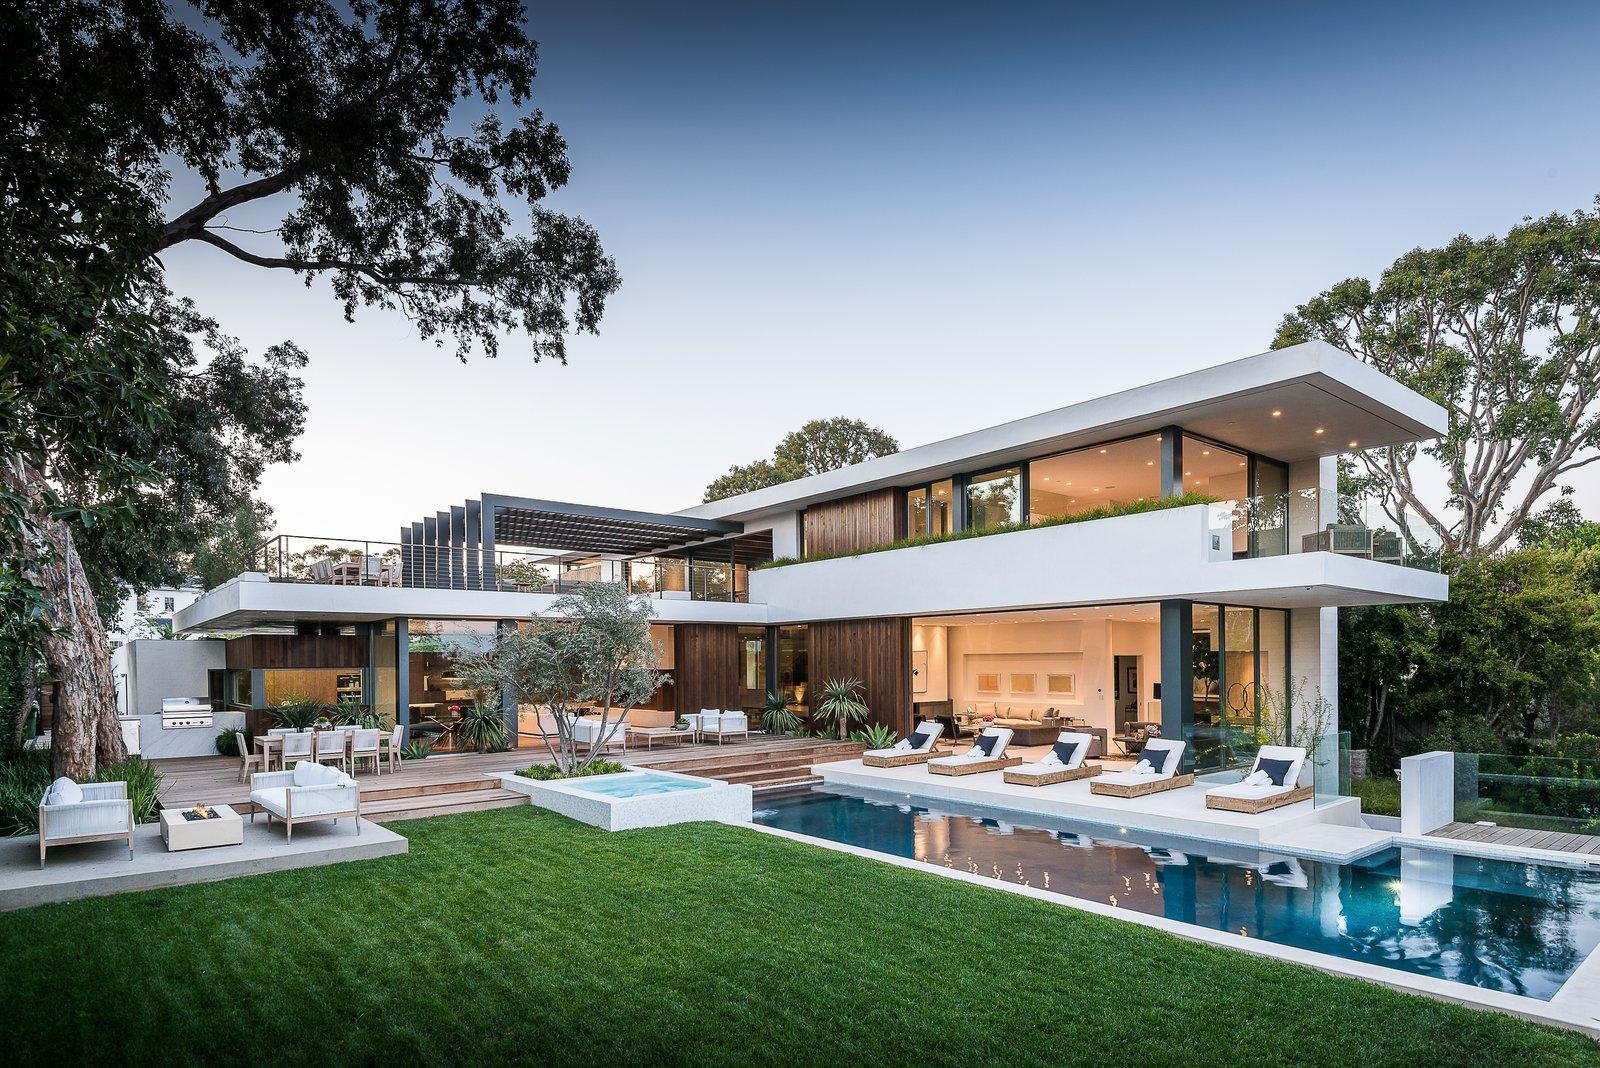 Exterior Amalfi Drive Residence by Daryl Olesinski